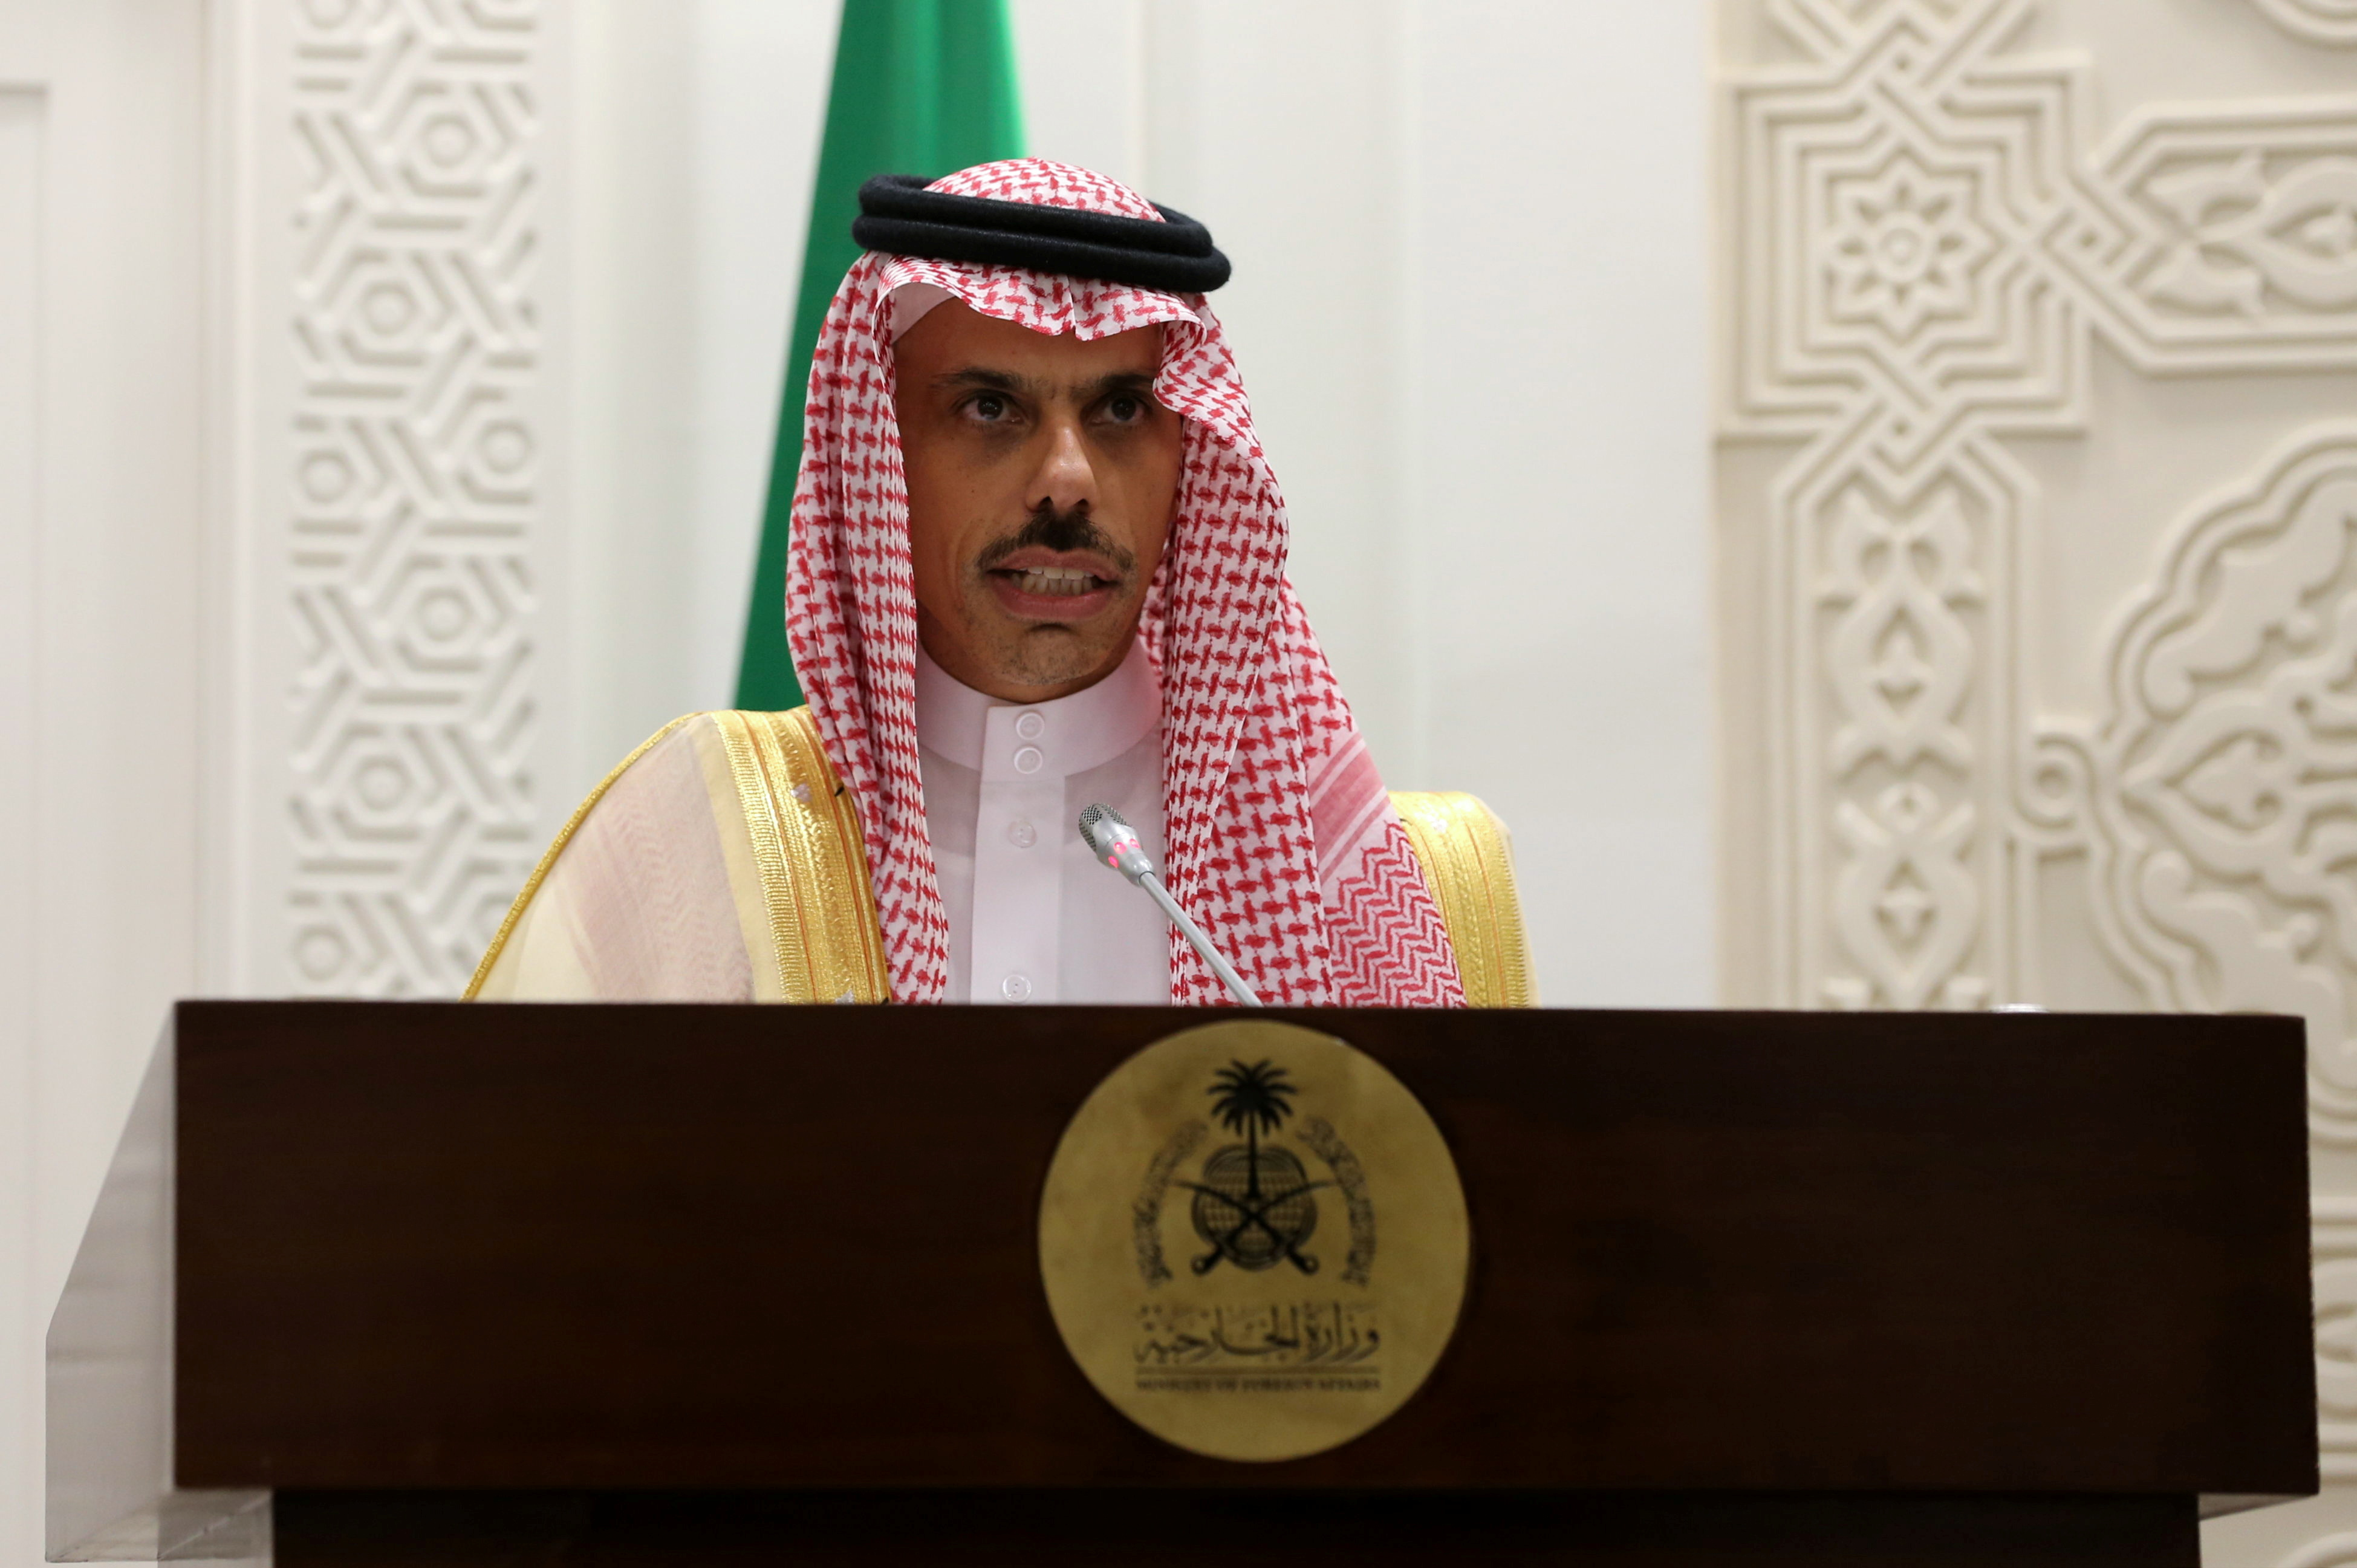 Saudi Arabia's Foreign Minister Faisal bin Farhan Al-Saud speaks during a joint news conference with EU foreign policy chief Josep Borrell in Riyadh, Saudi Arabia, October 3, 2021. REUTERS/Ahmed Yosri